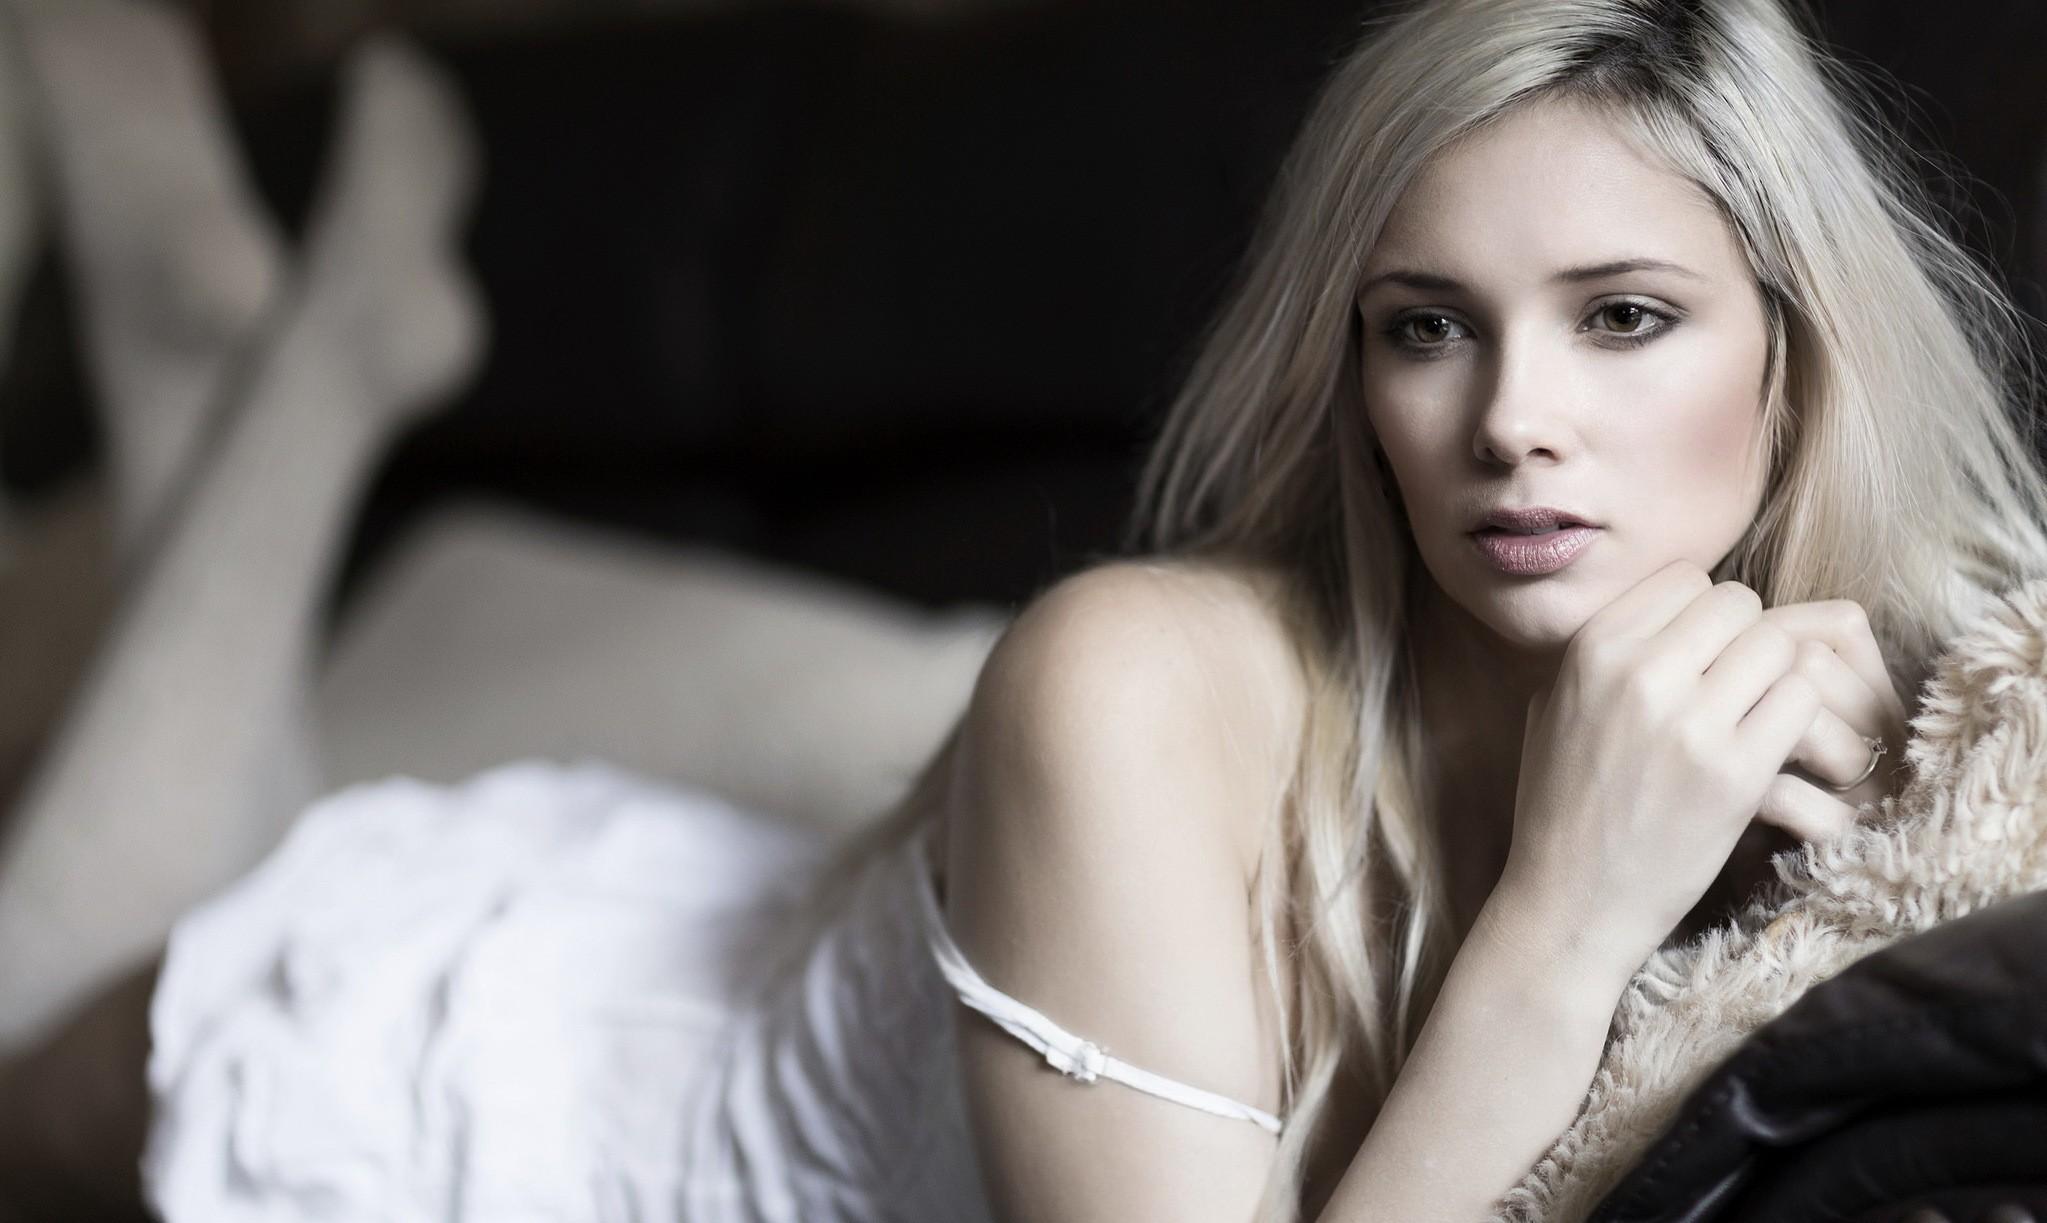 Hd Wallpaper 2014 Download 2047x1223 Louisa Marie Women Face Model